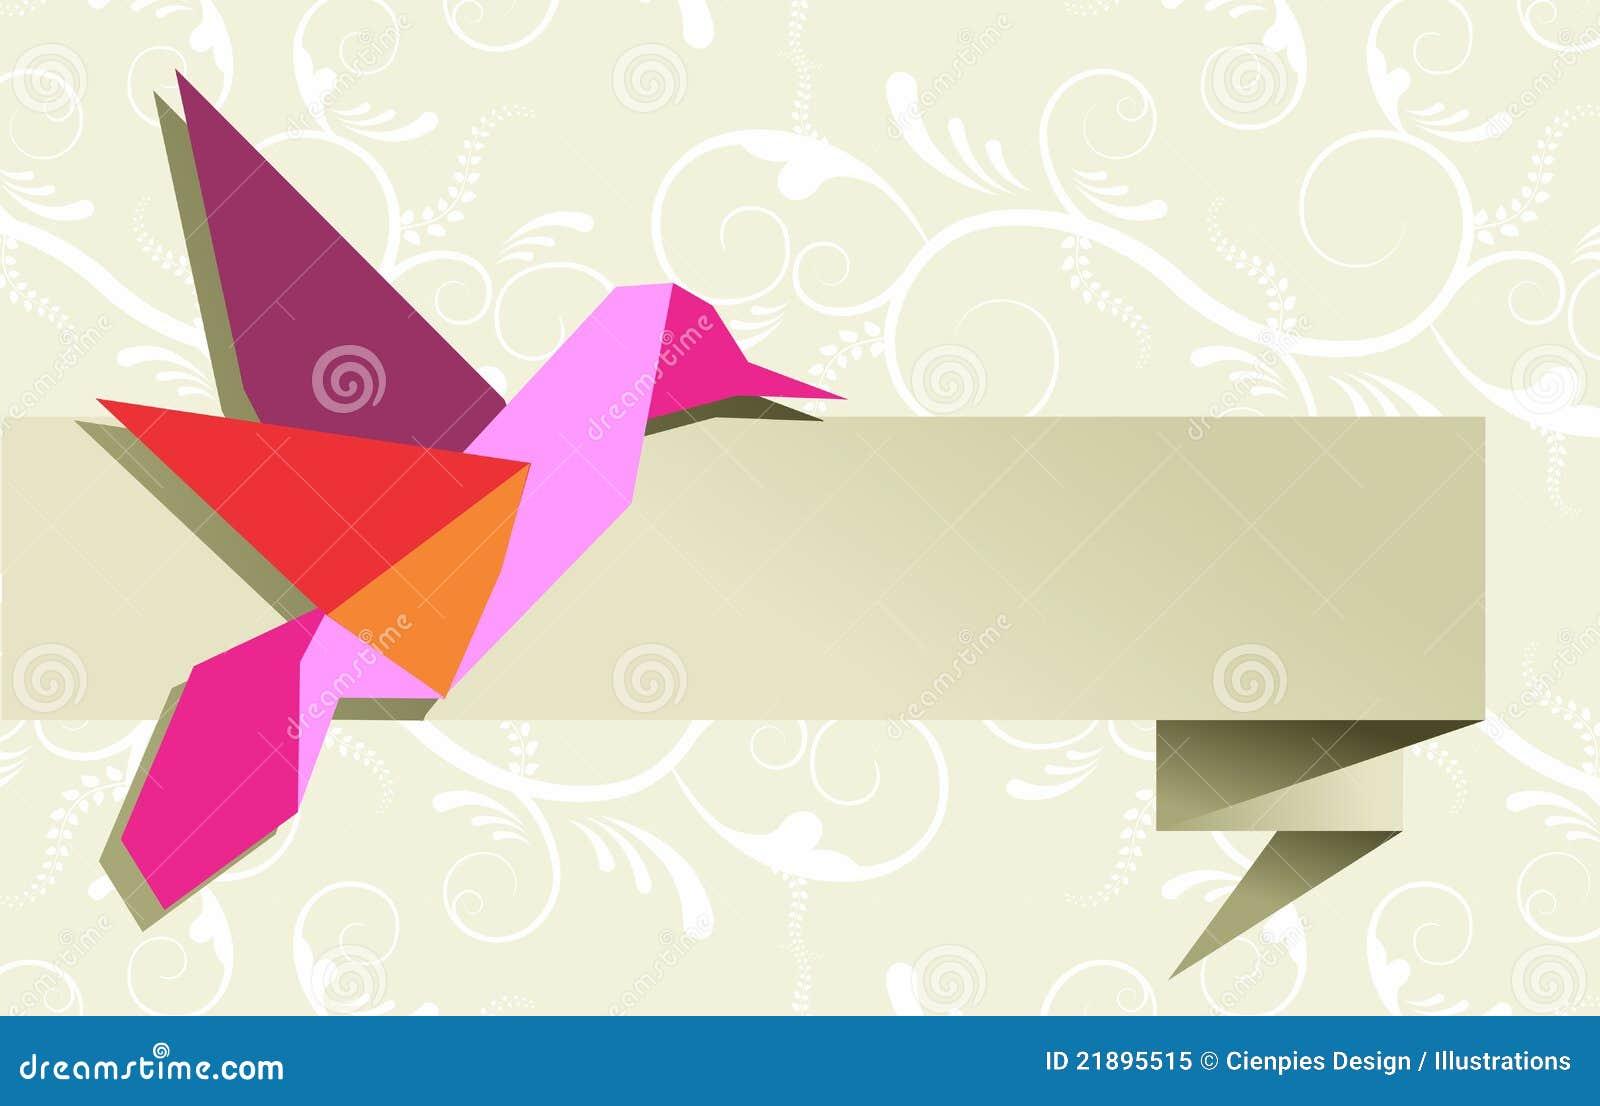 exemple origami oiseau colibri origami t origami. Black Bedroom Furniture Sets. Home Design Ideas